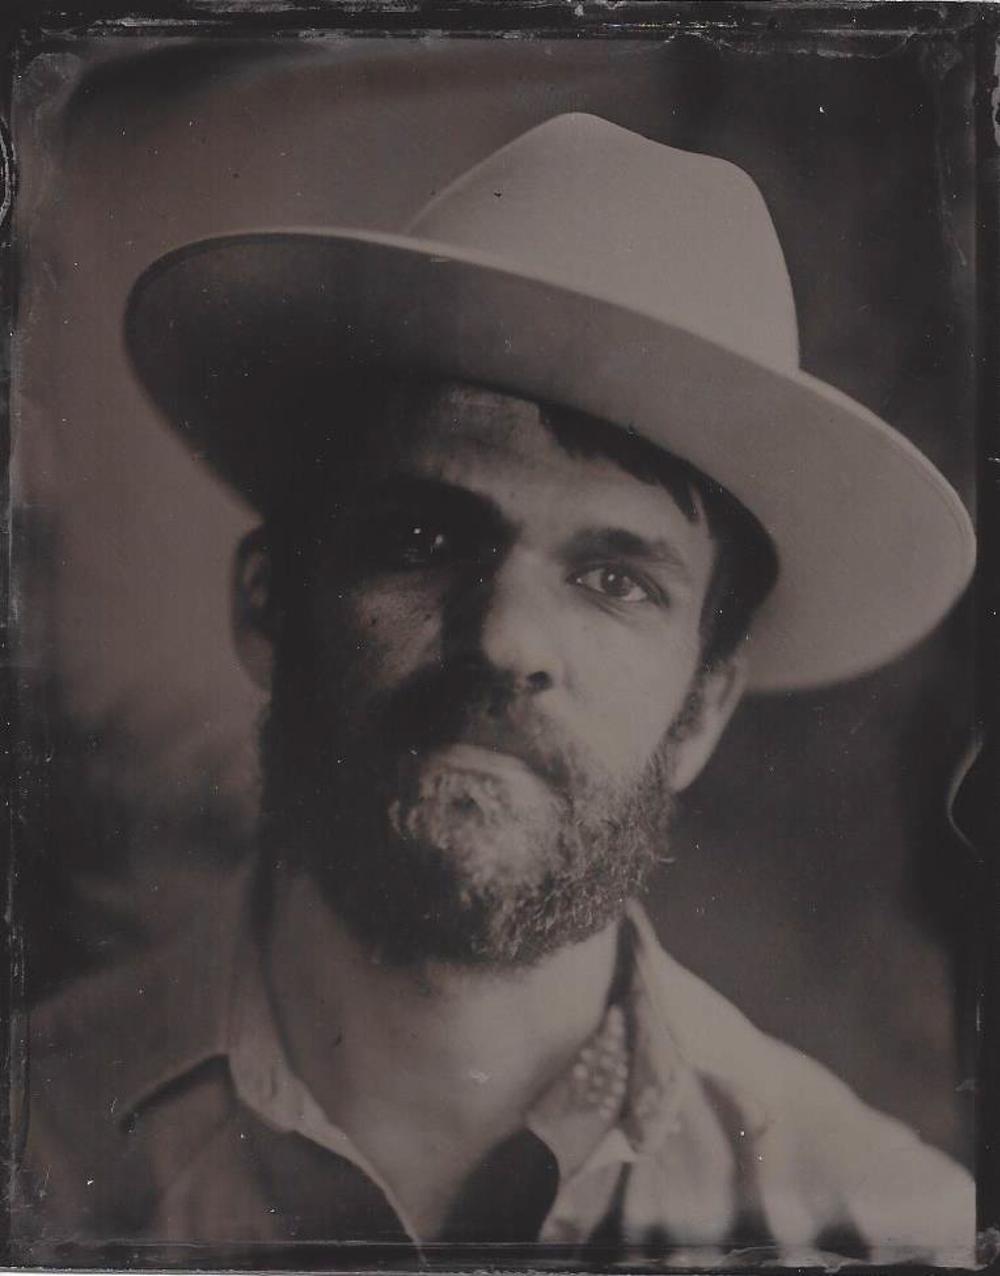 J. HARDIN - MADISON, WI